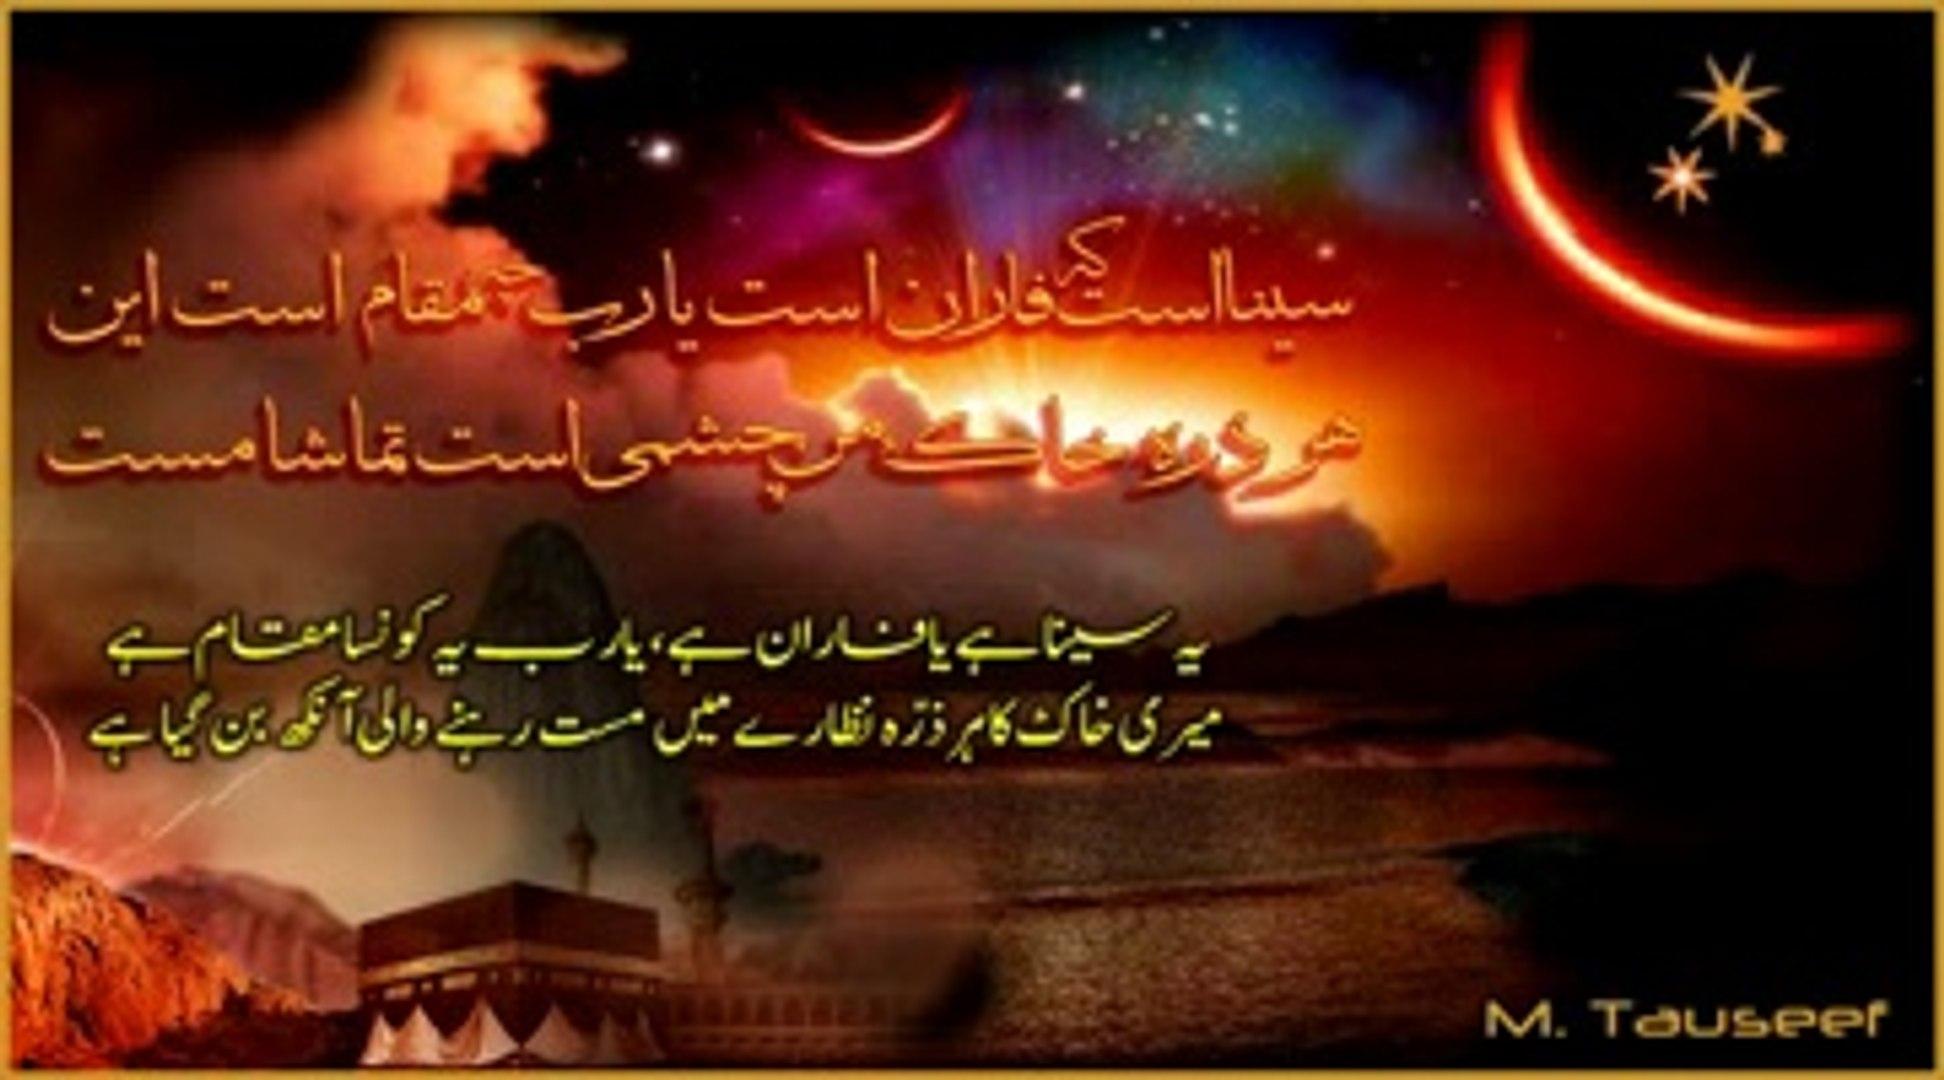 Allama Iqbal by Munshi Raziuddin - Az dair-e-mughan aayem (With Urdu  Translation)